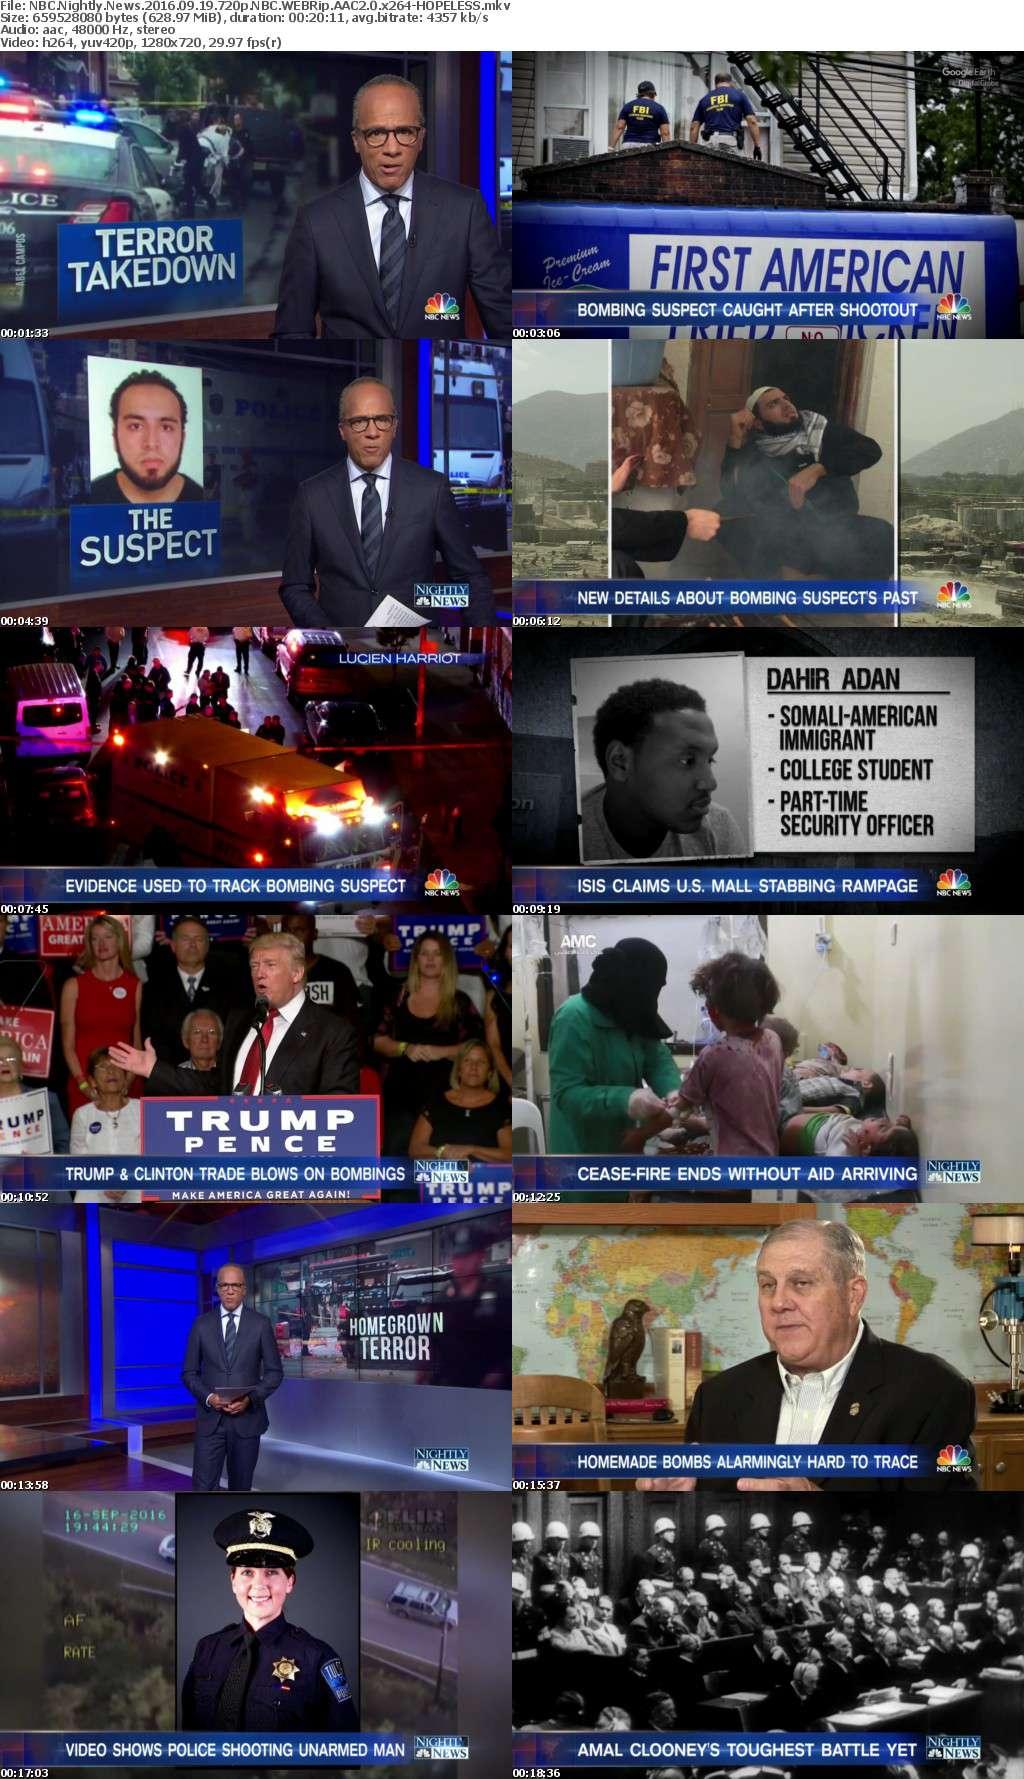 NBC Nightly News 2016 09 19 720p NBC WEBRip AAC2 0 x264-HOPELESS